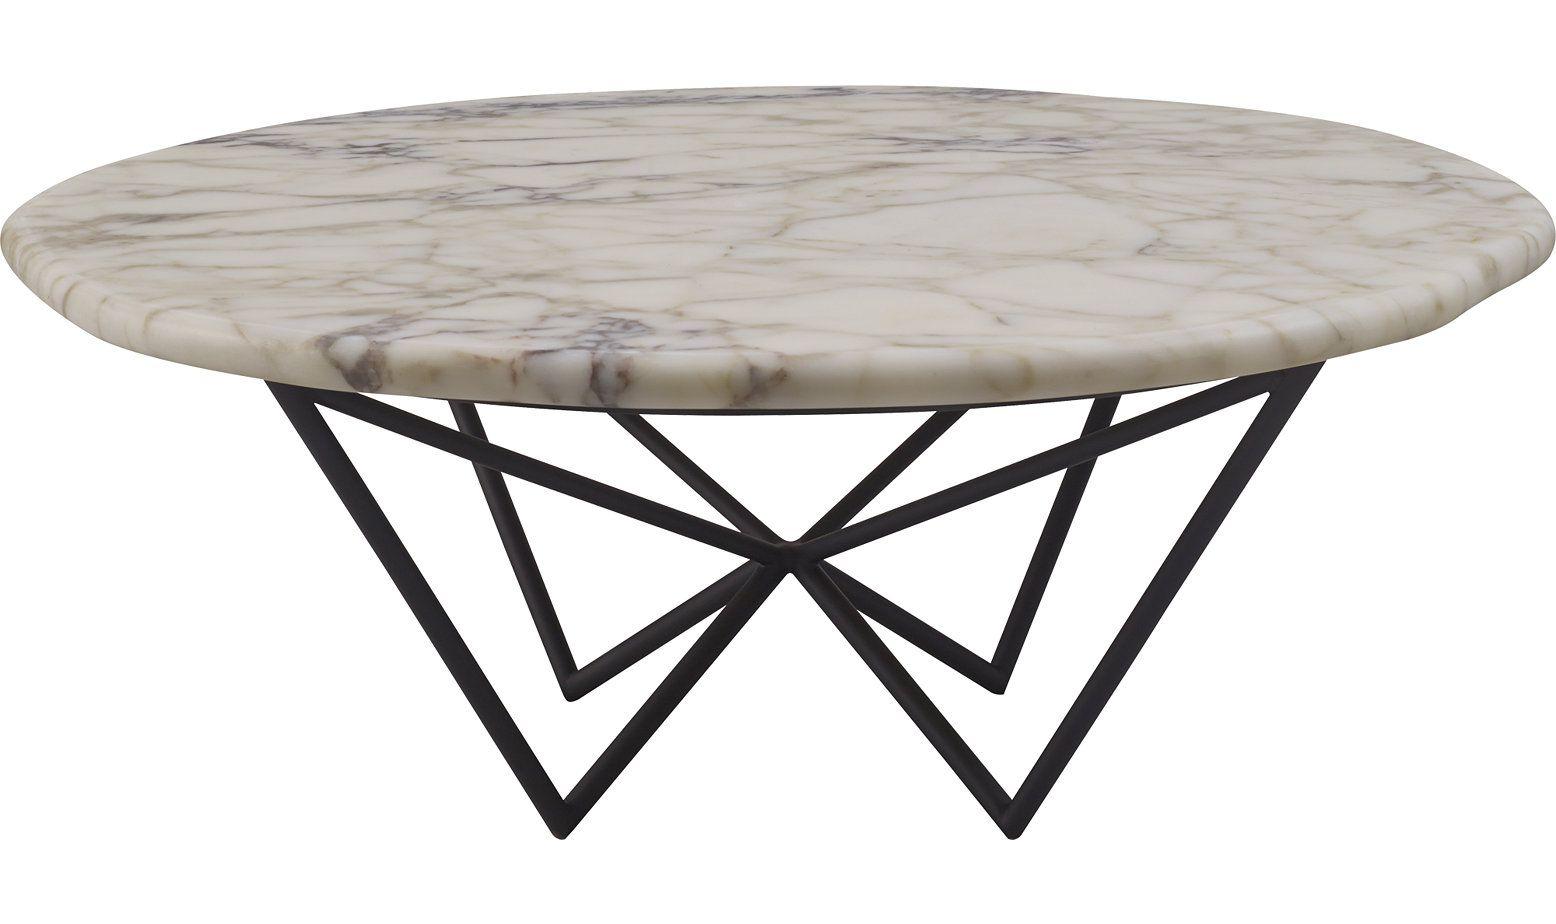 Tumble Cocktail Table By Kara Mann Mr7051 Baker Furniture Sleek Furniture Coffee Table Baker Furniture [ 924 x 1556 Pixel ]